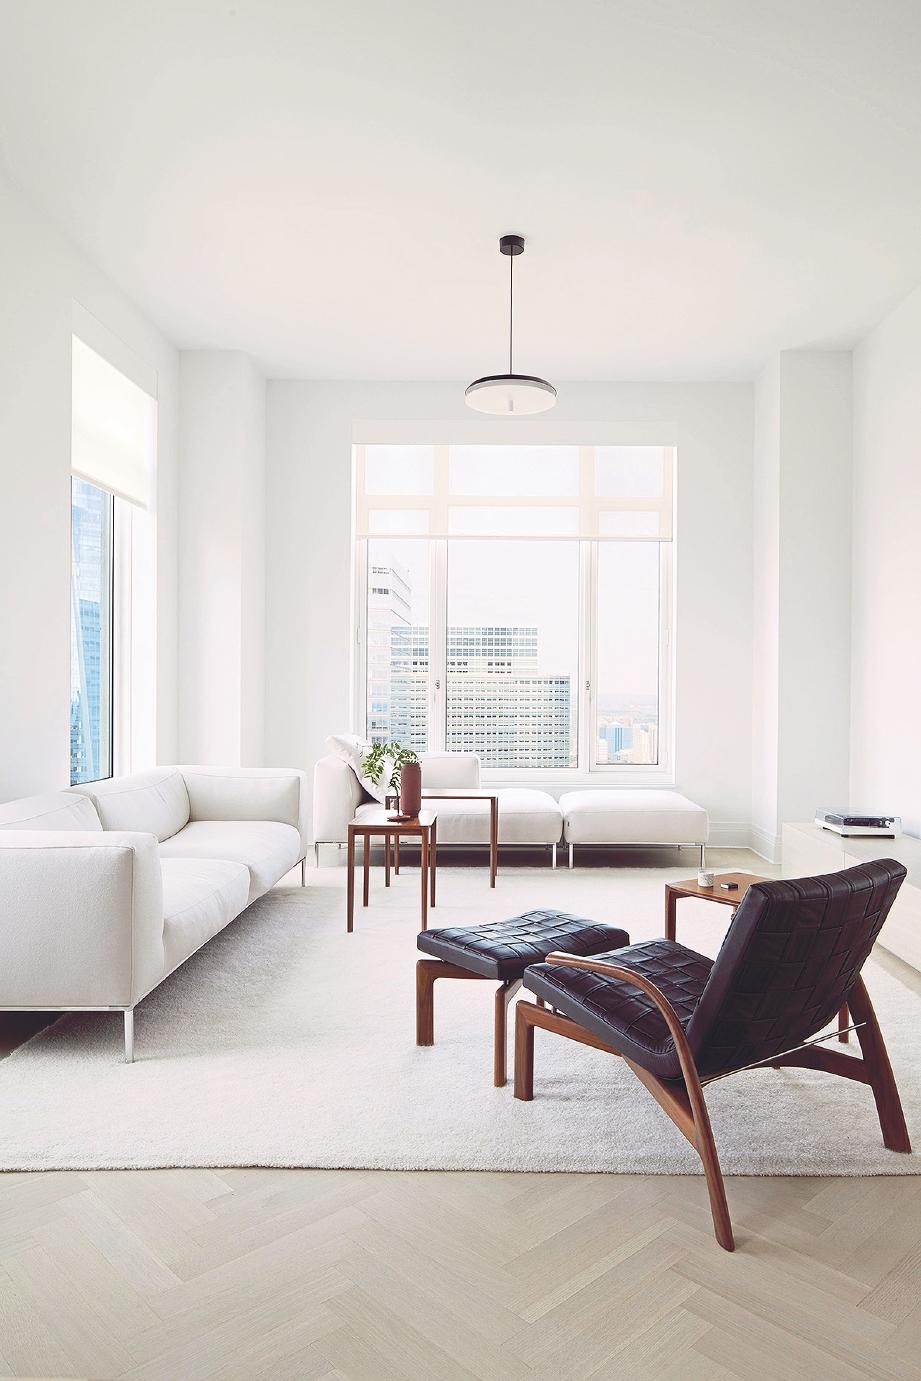 APARTMEN mewah menggunakan perabot berjenama dan palet monokrom.